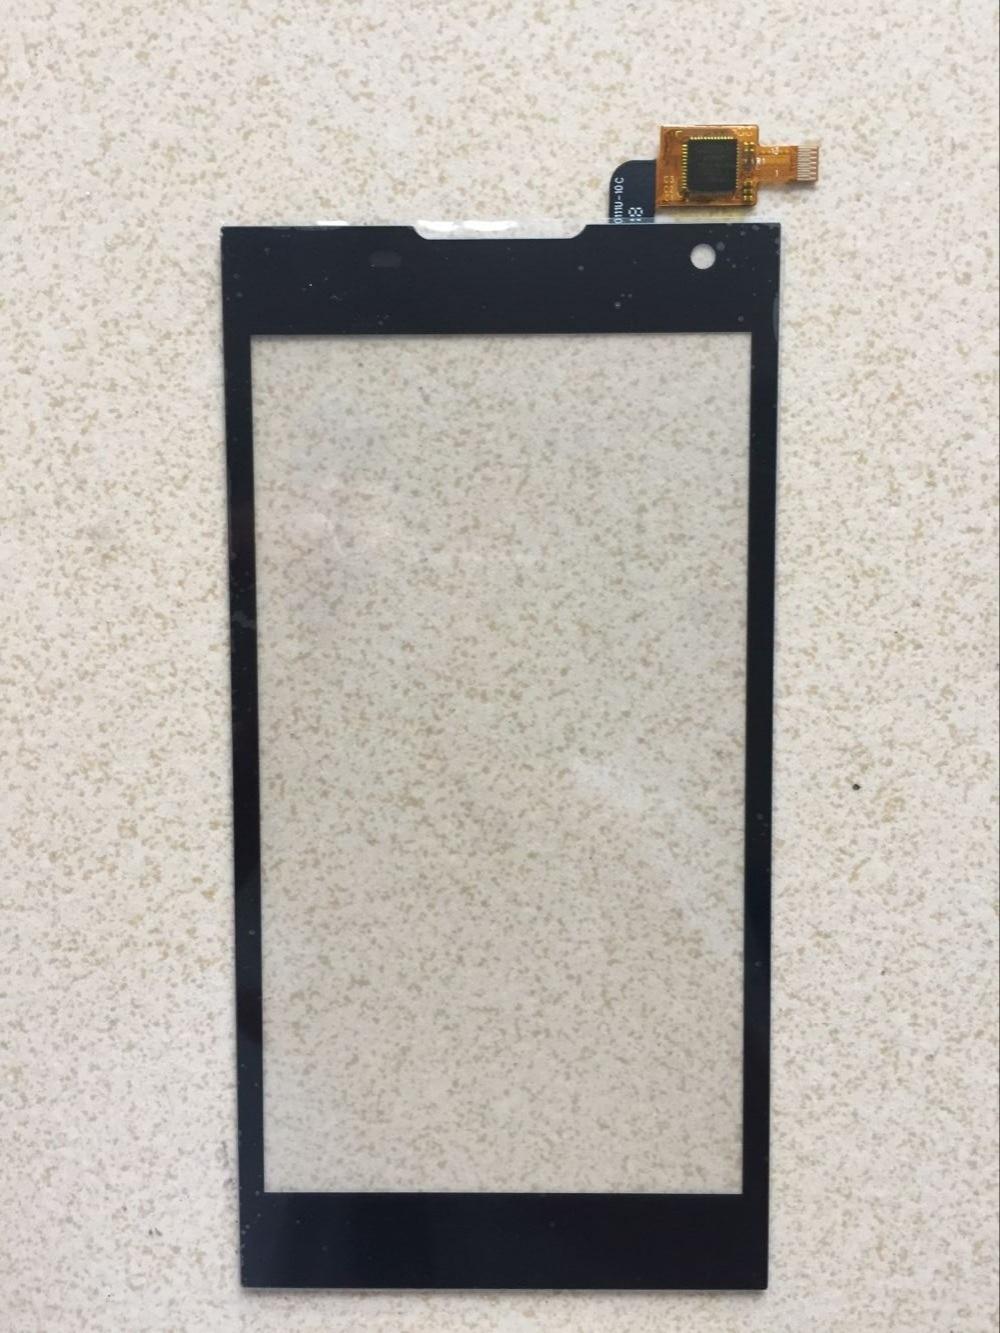 Original digitizer touch Screen Glass sensor panel lens glass replacement FOR DEXP Ixion M150 Storm Free